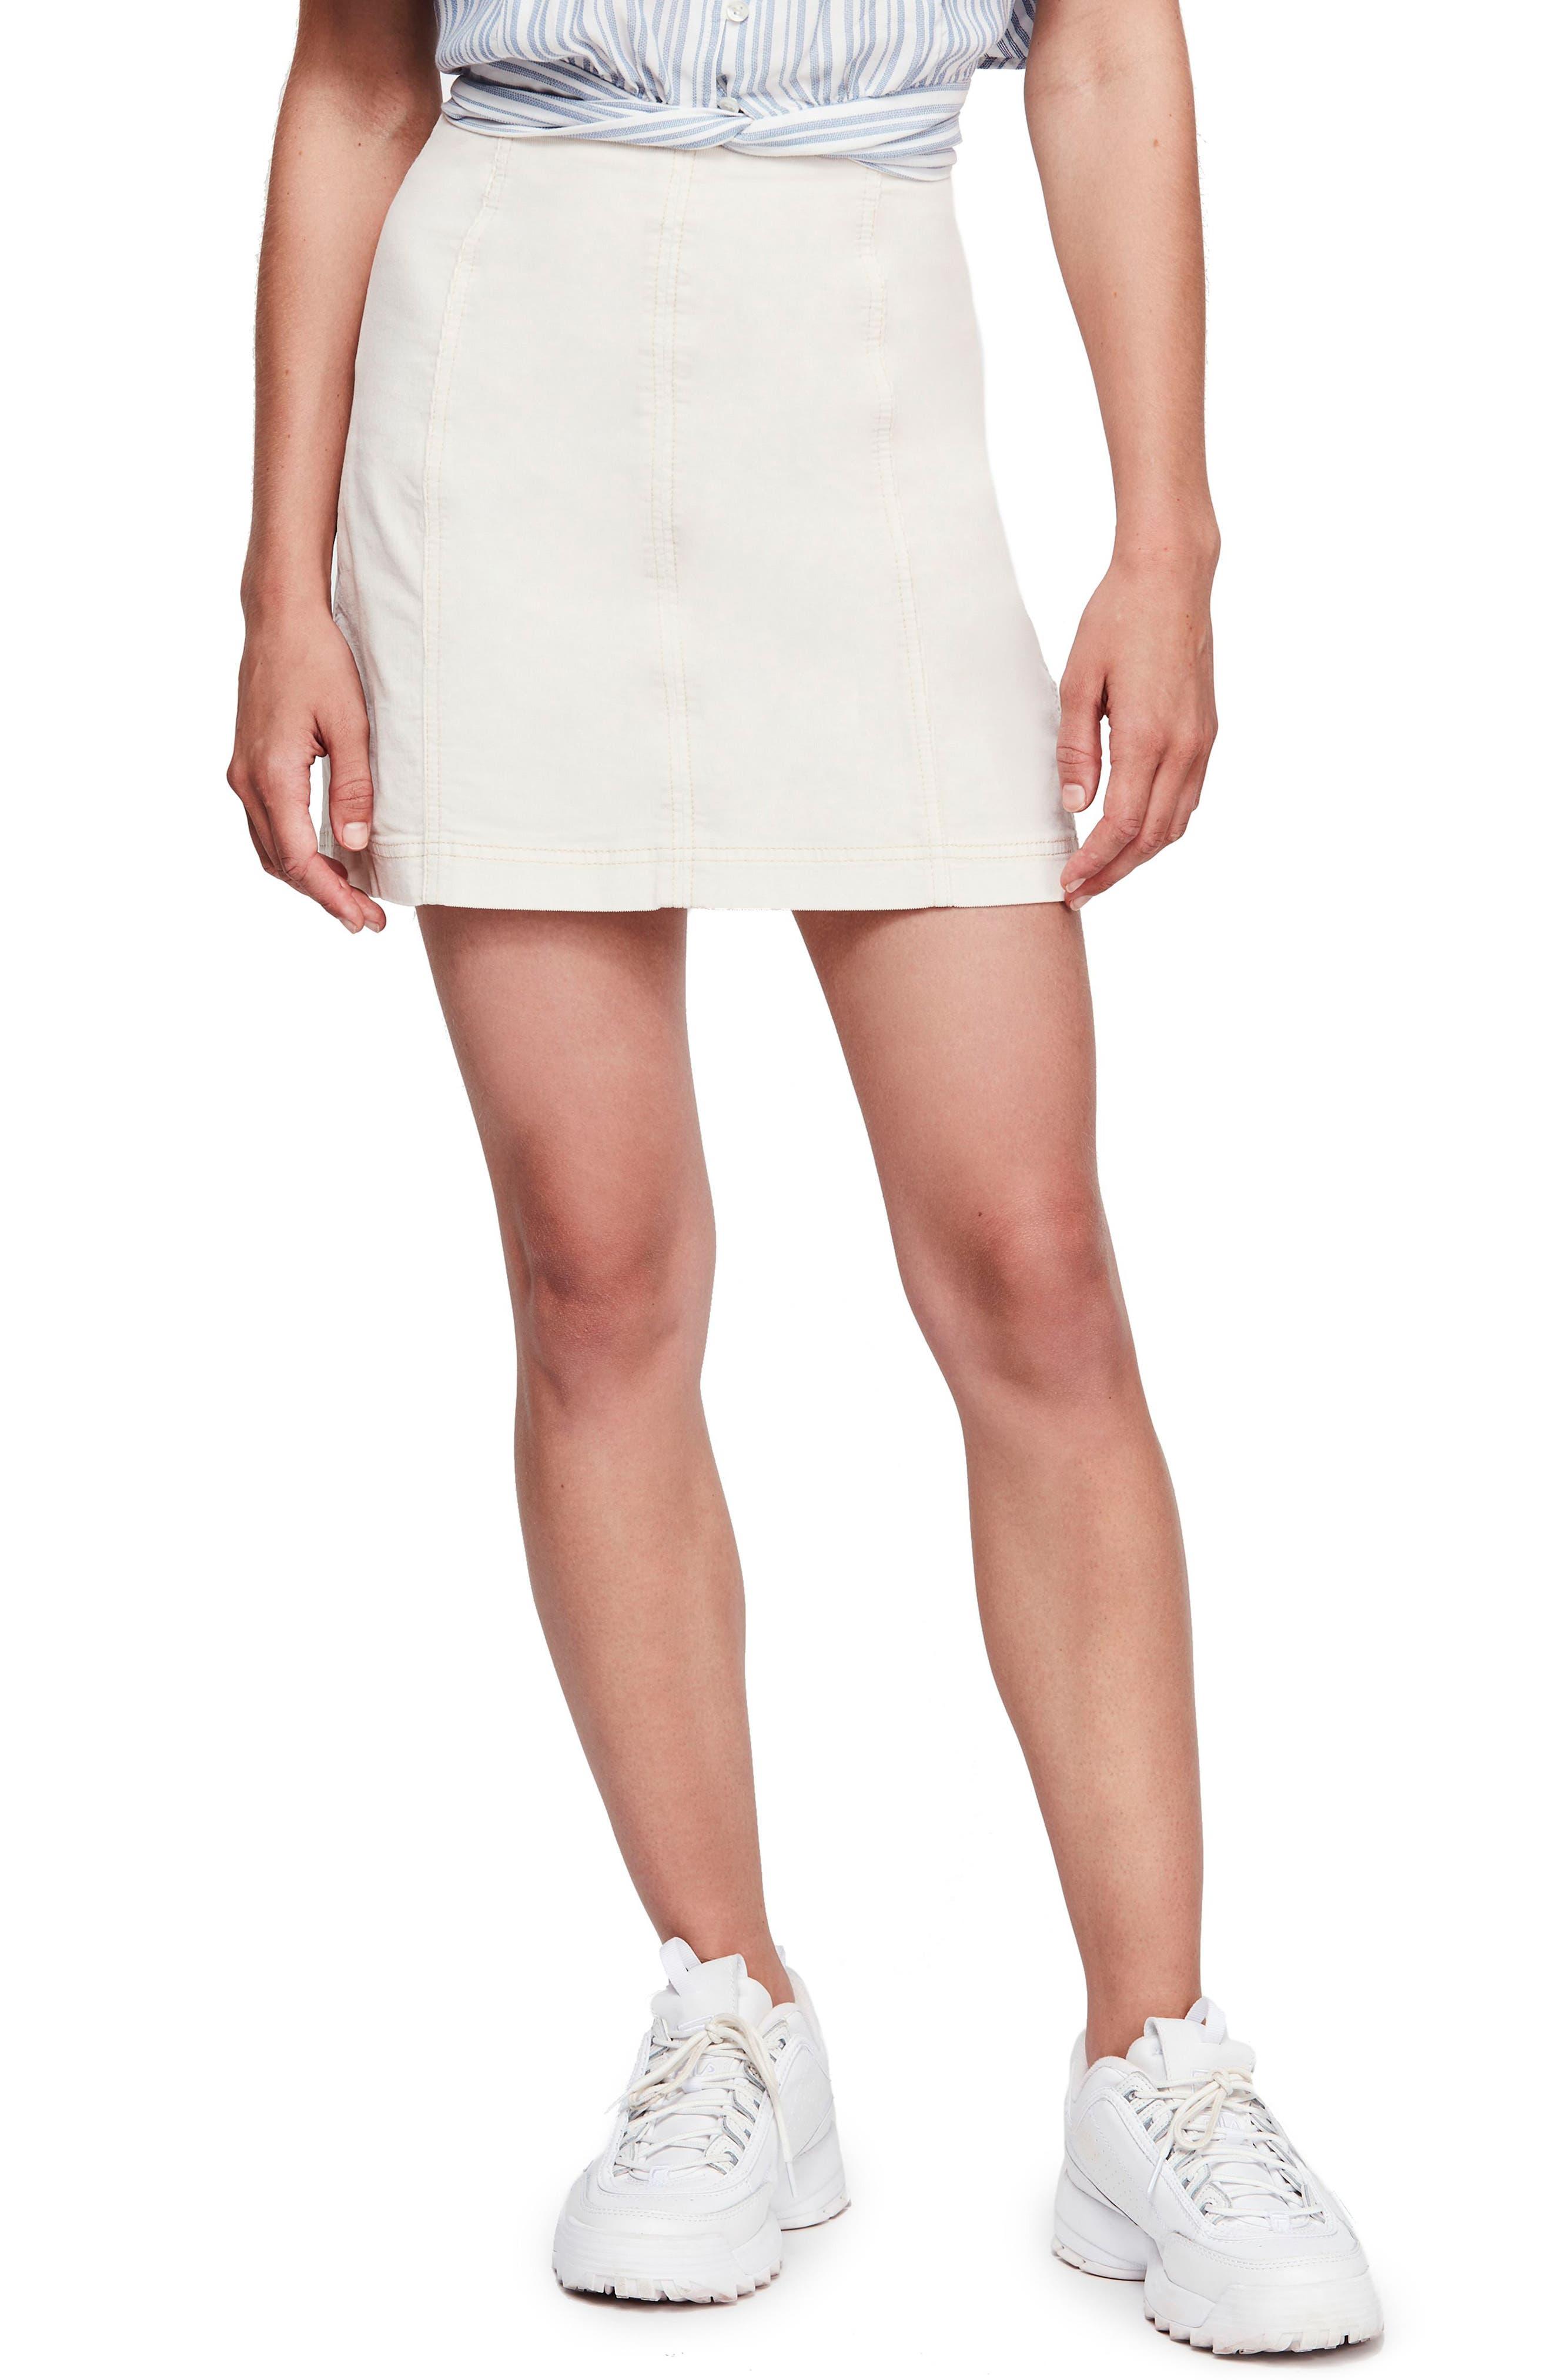 Free People Corduroy Miniskirt, Ivory